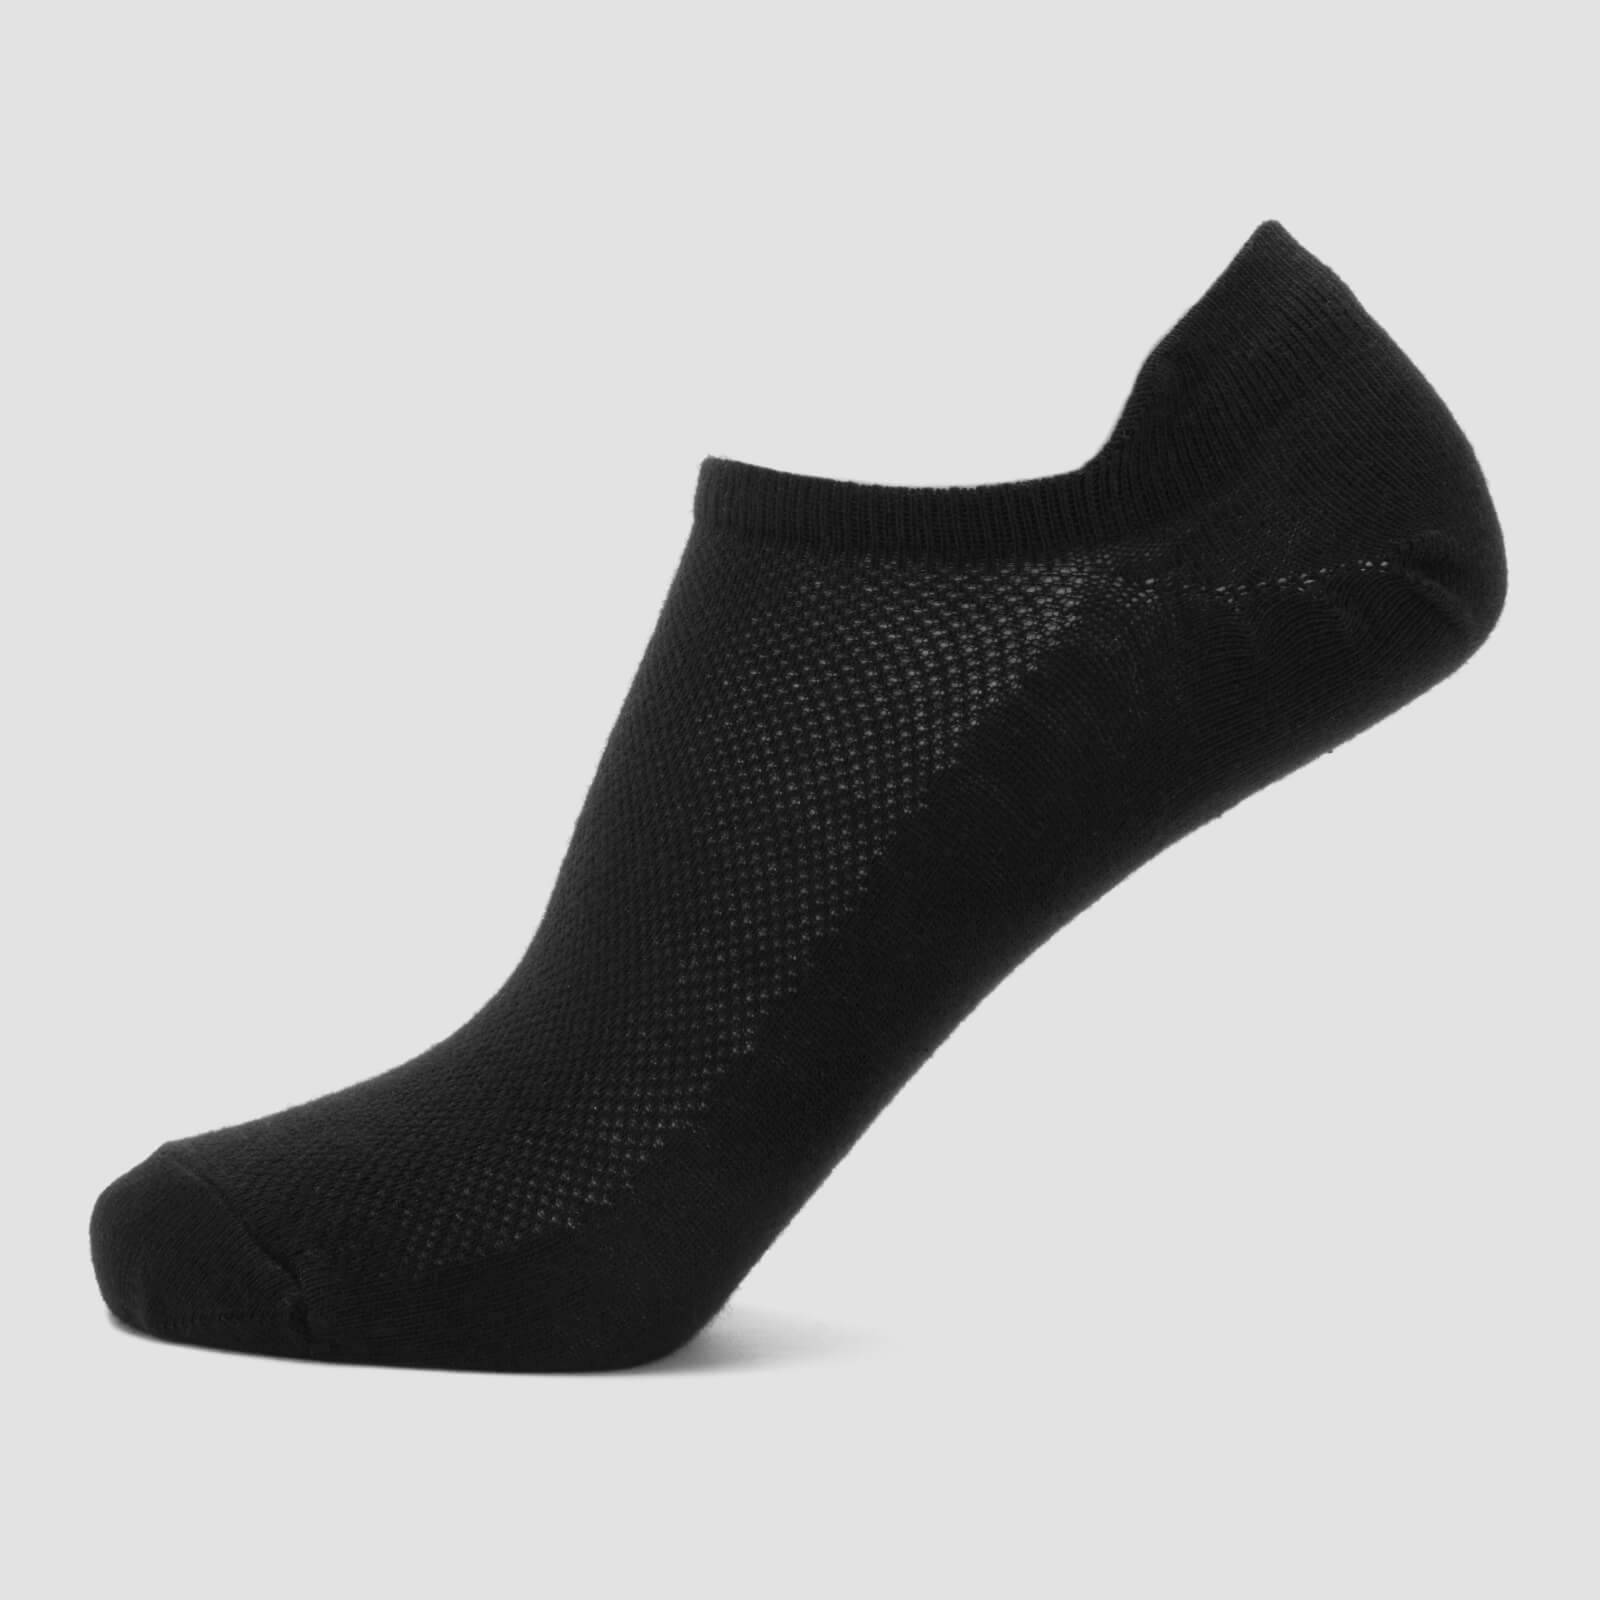 Myprotein MP Essentials Women's Ankle Socks - Black (3 Pack) - UK 3-6